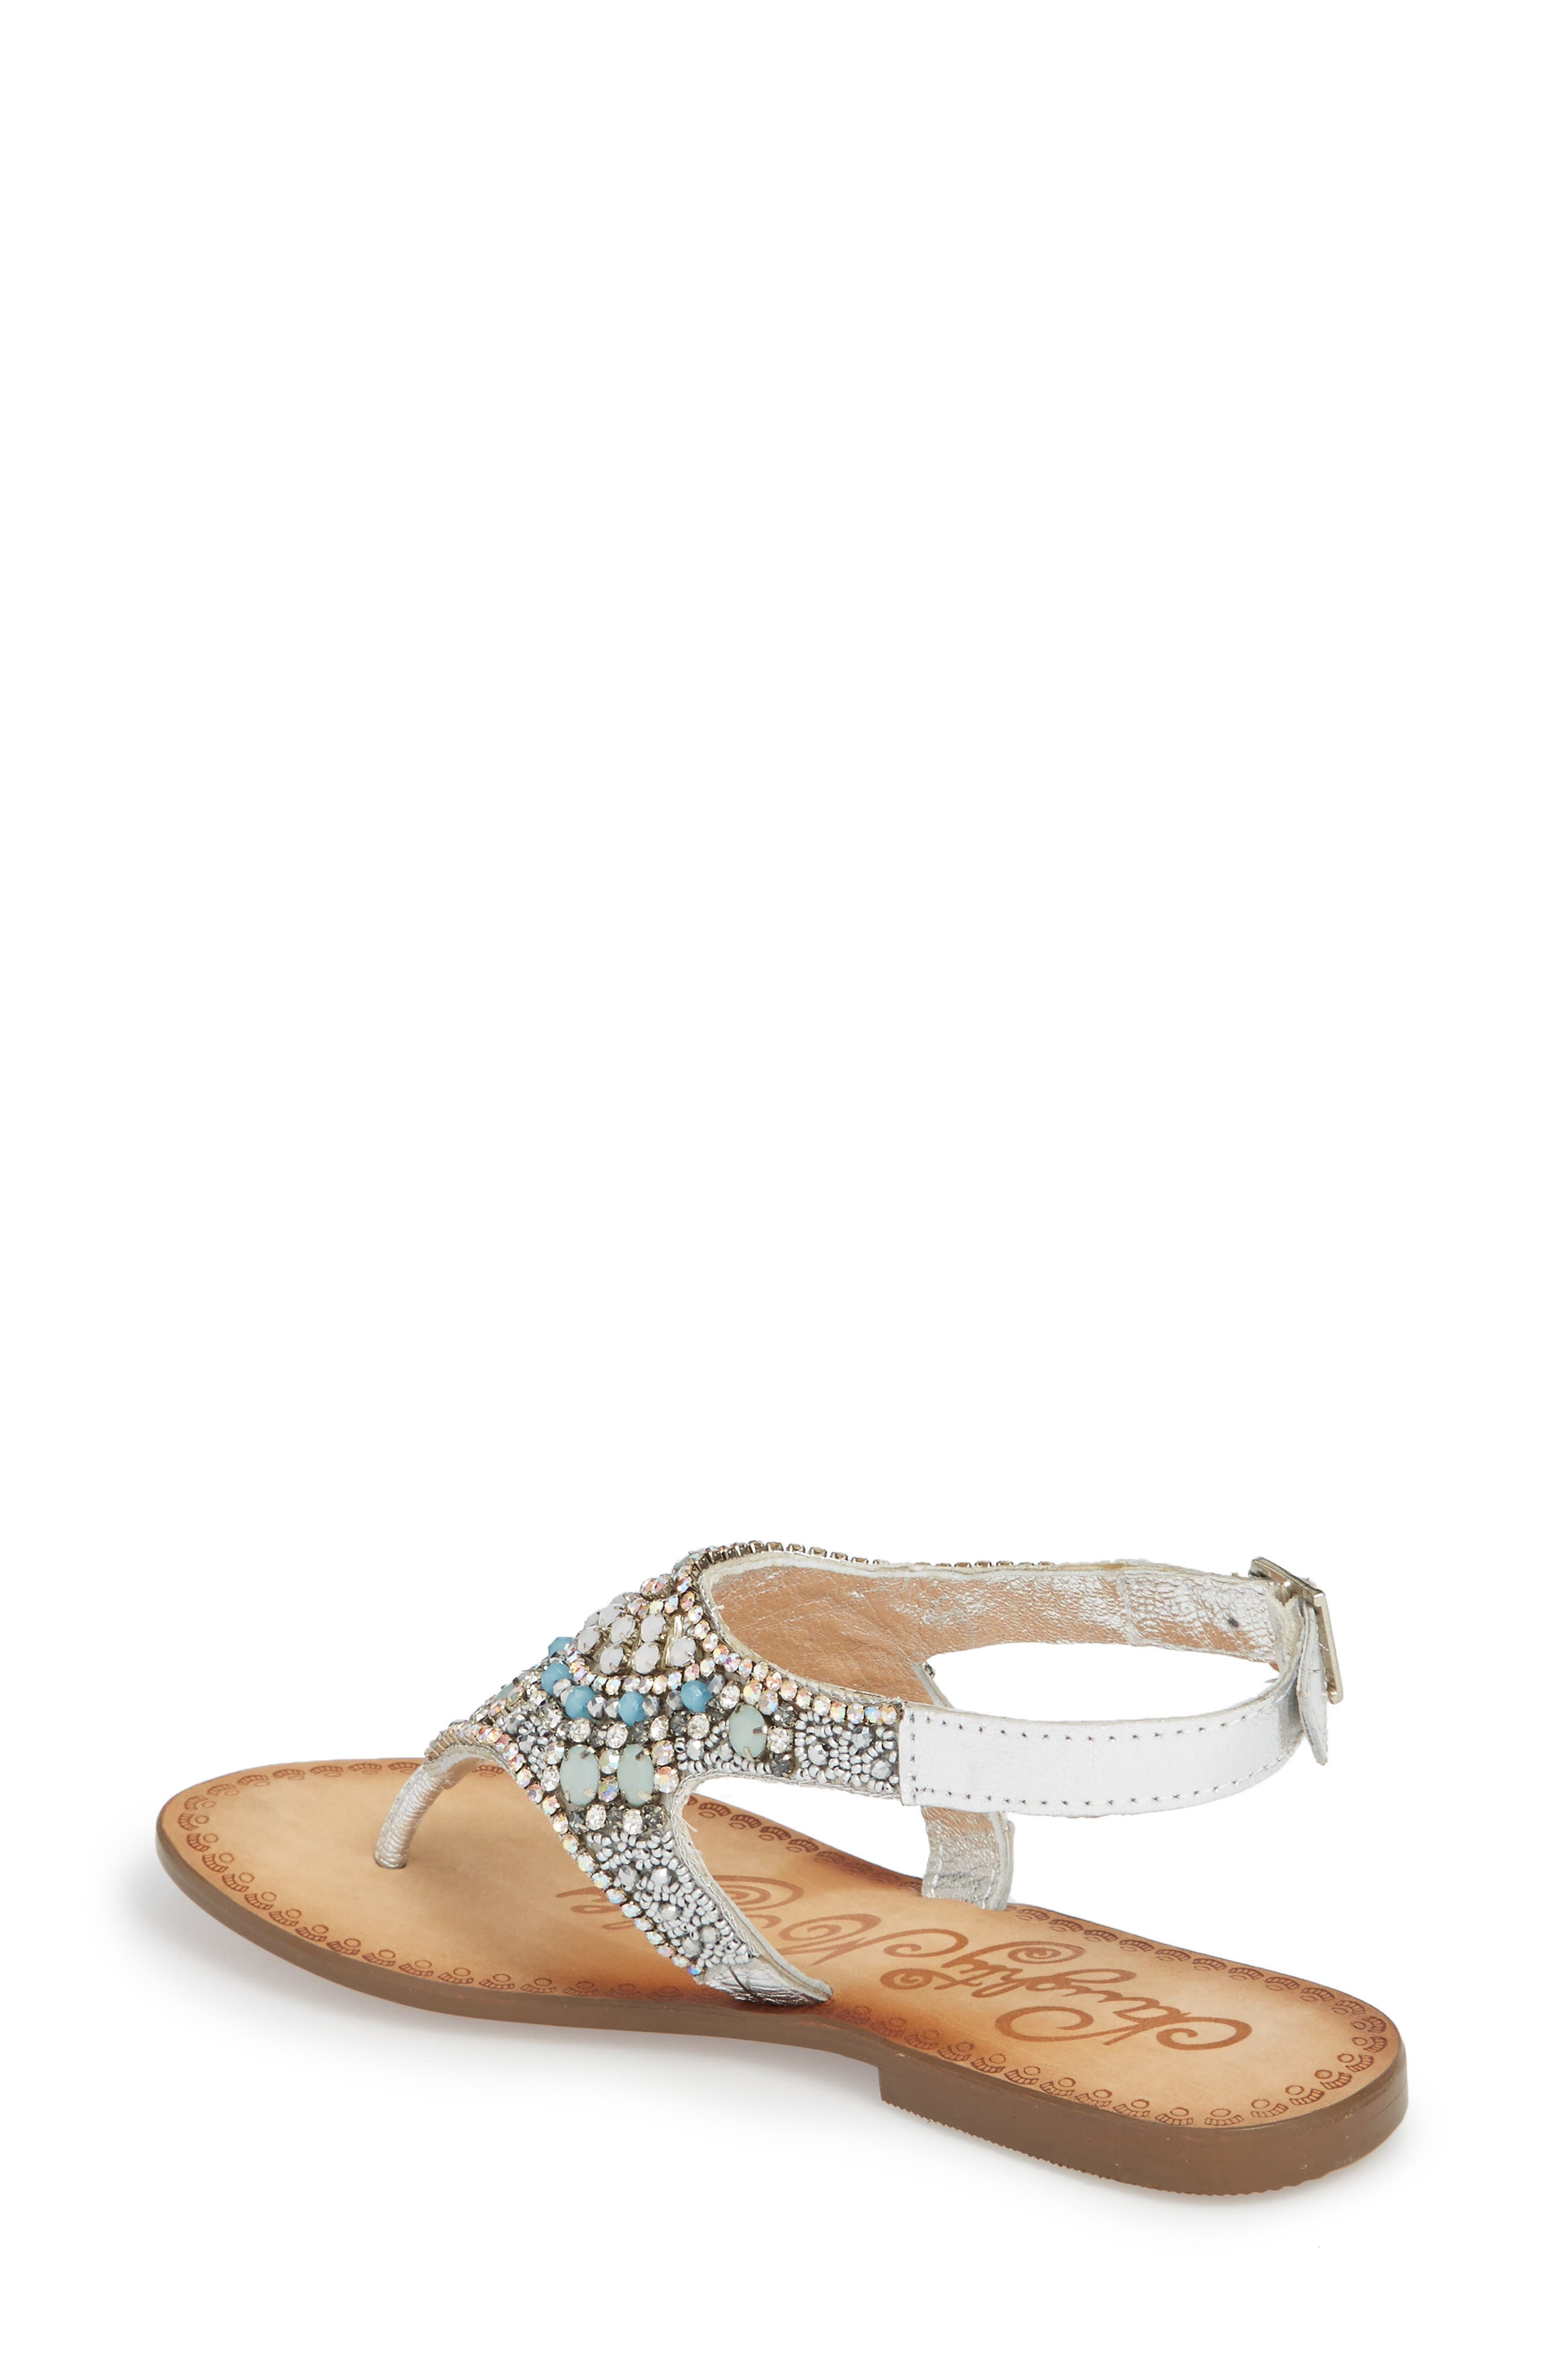 Iceberg Crystal Embellished Sandal,                             Alternate thumbnail 2, color,                             040